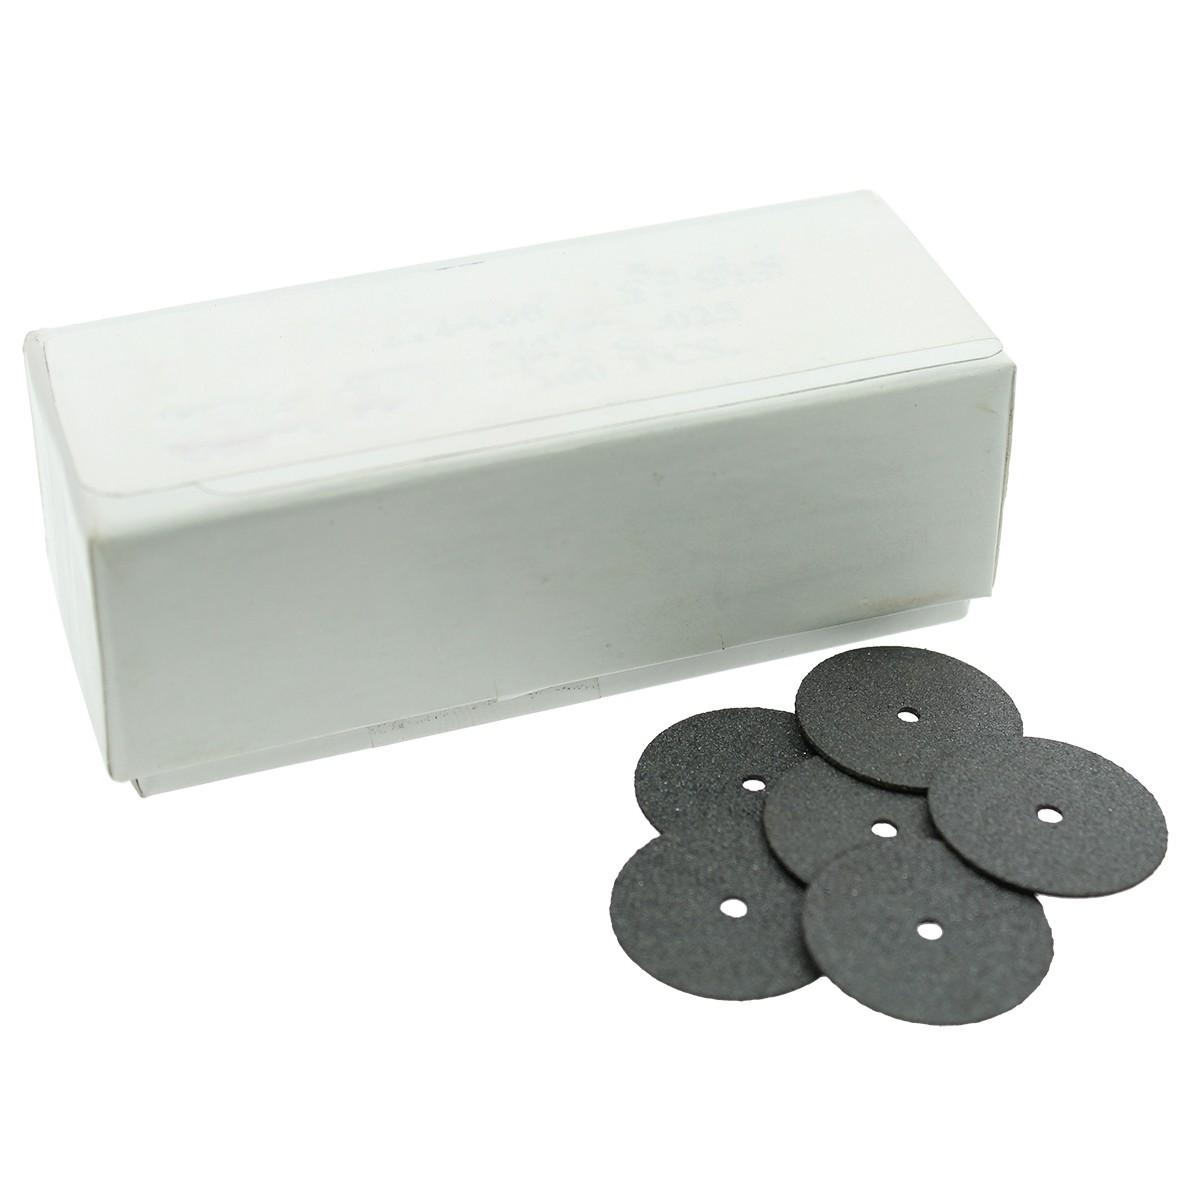 "Separating Discs - High Speed - 1"" x 0.022"" - 50"